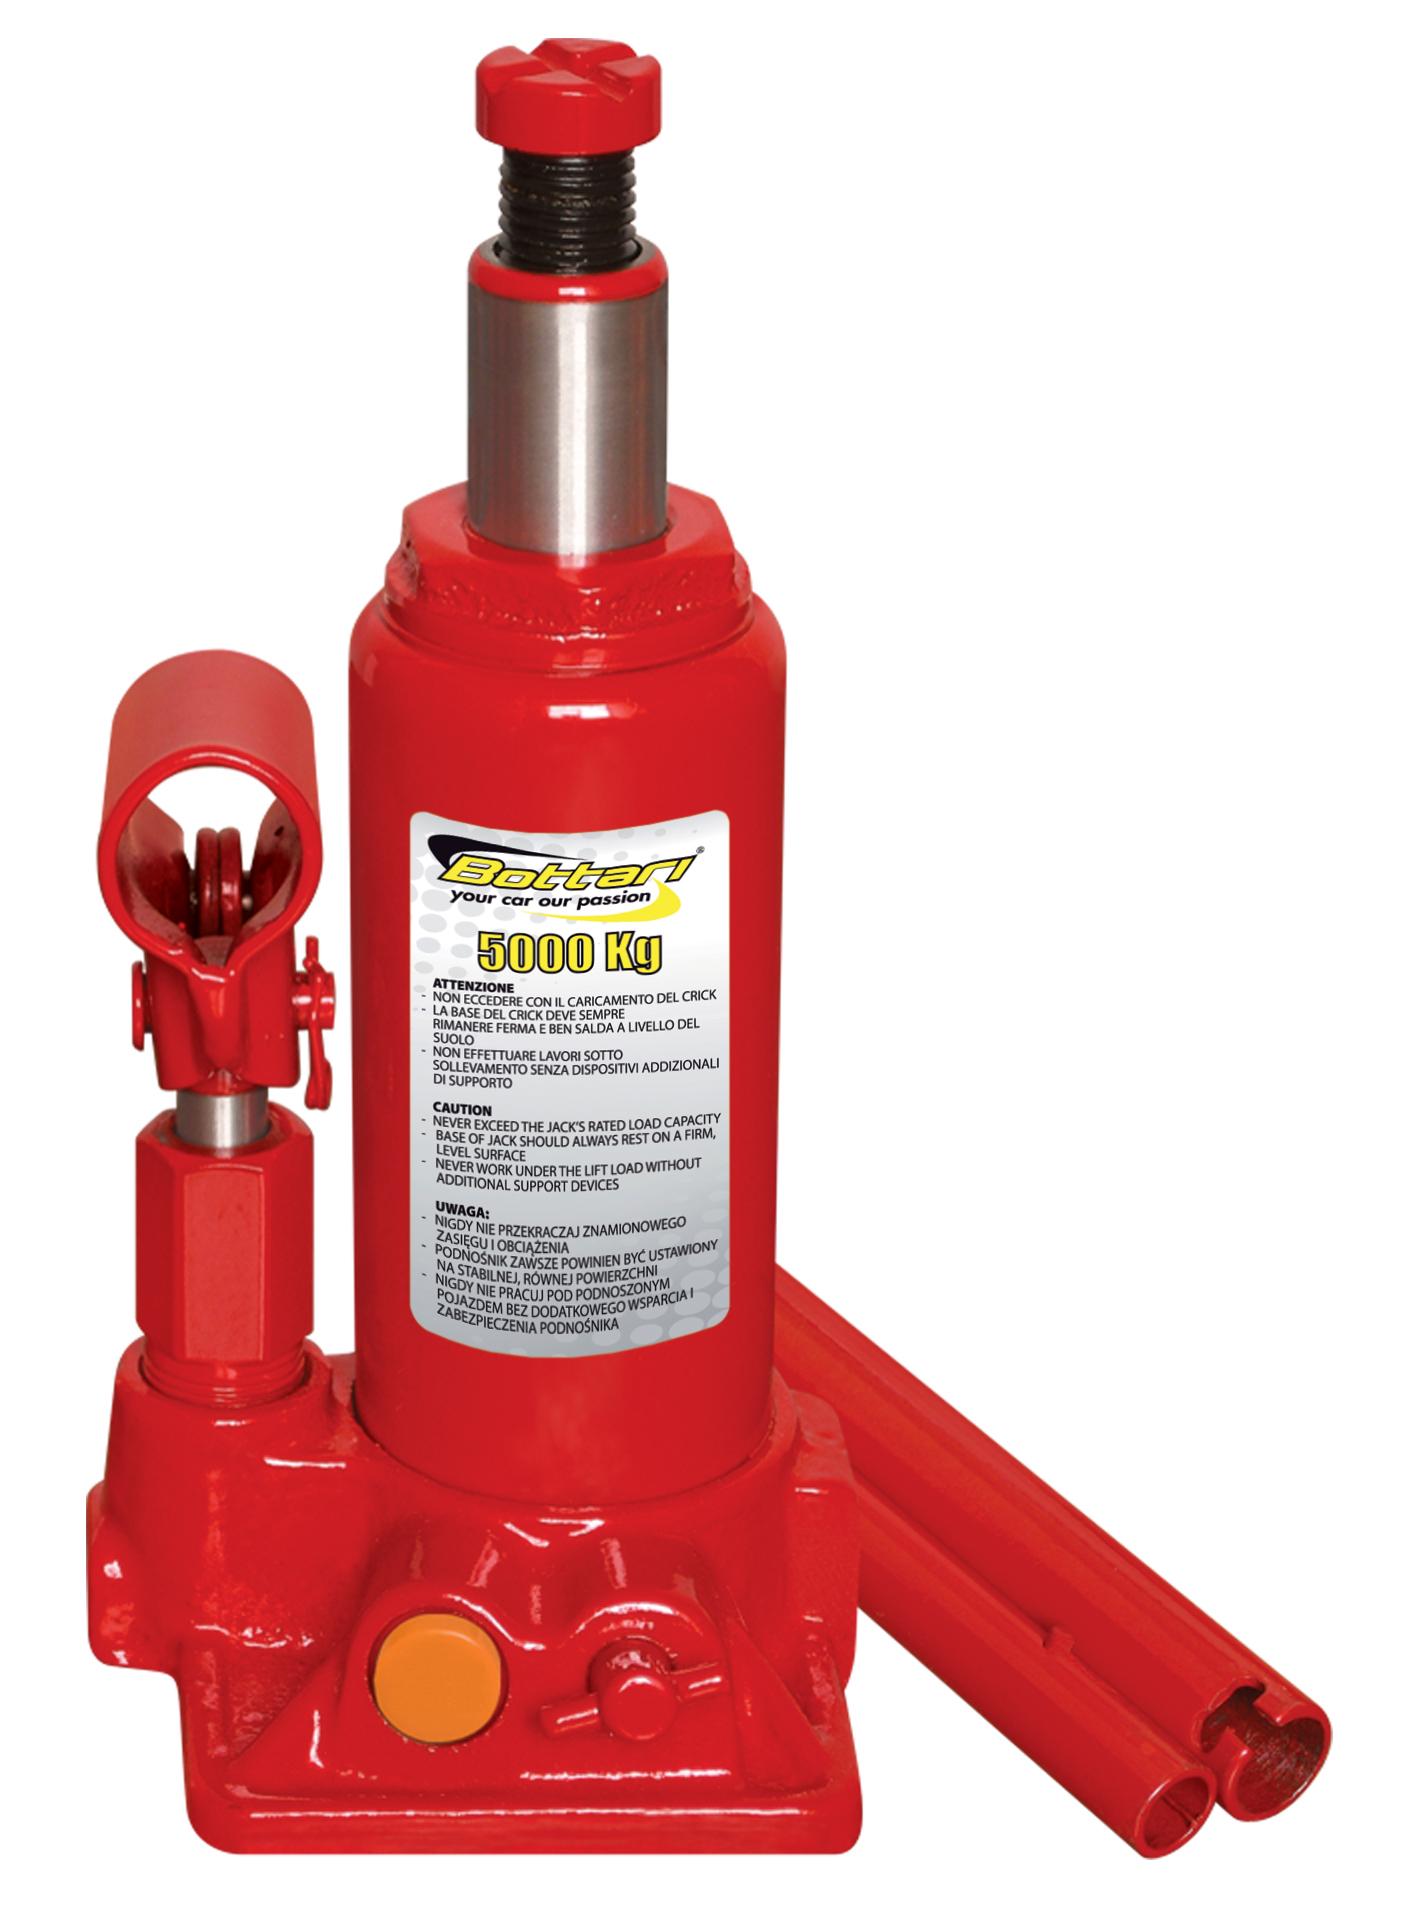 bottari-24181-gato-hidraulico-botella-5-ton